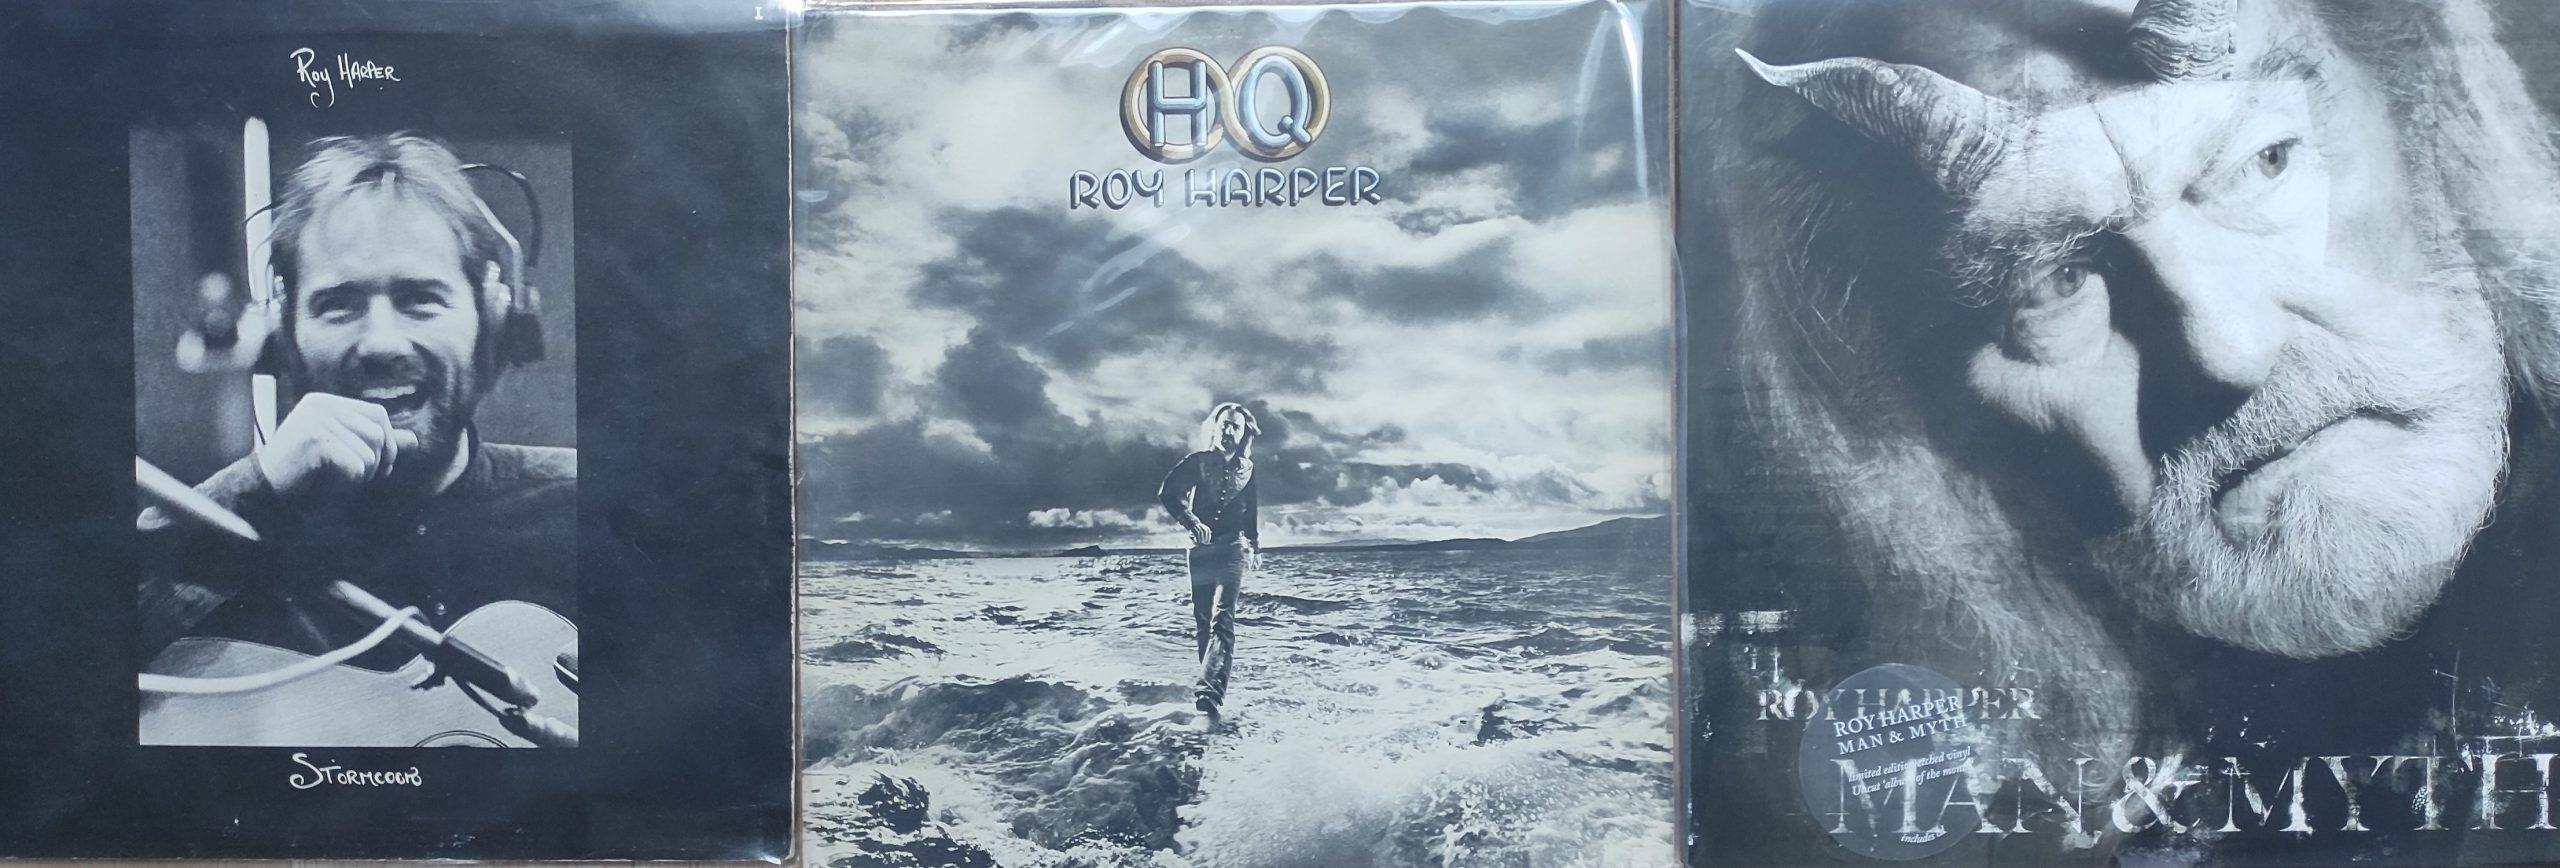 Roy Harper 3 albums incontournables